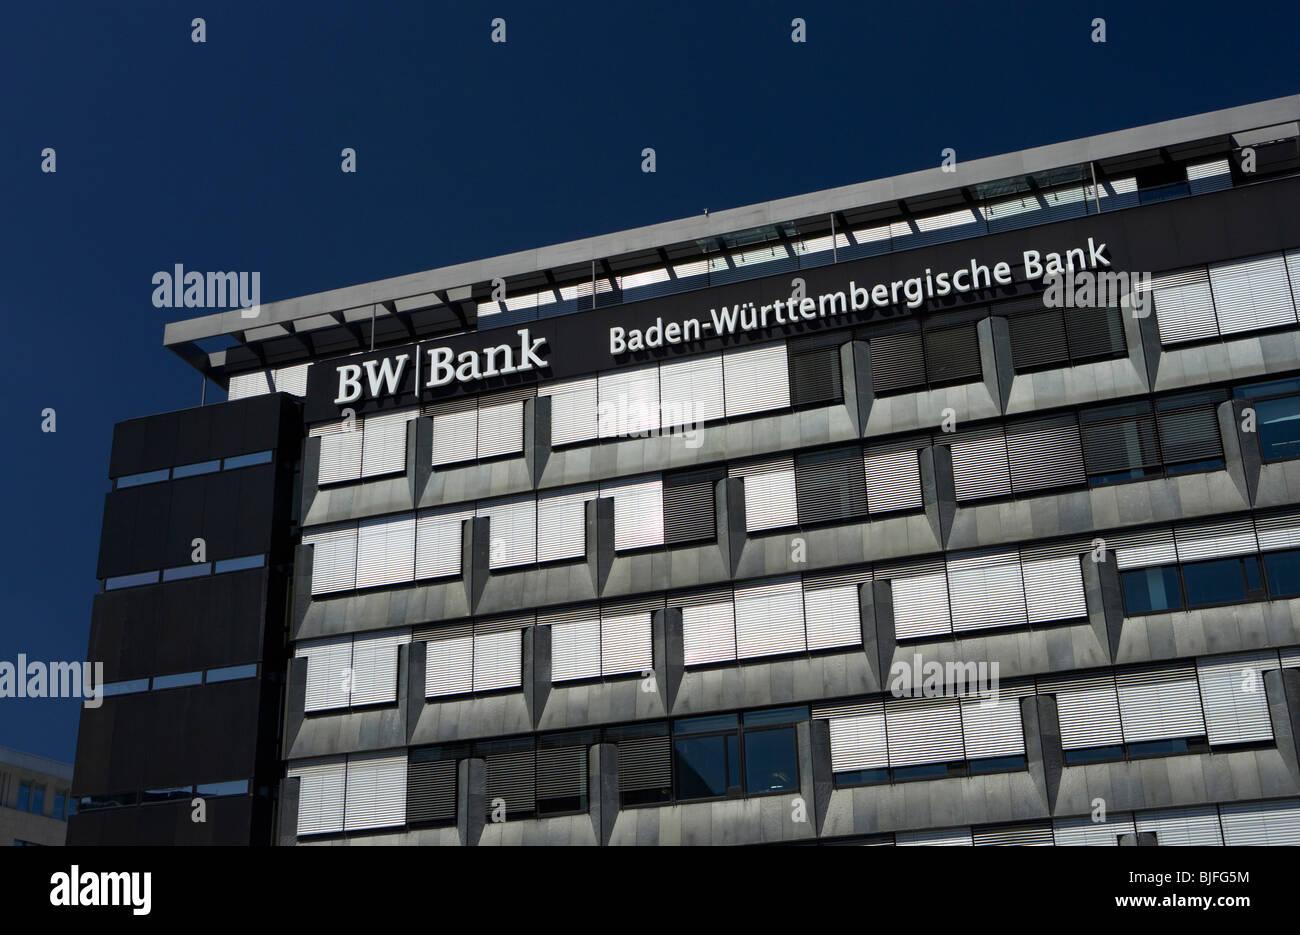 Headquarters Of The Bw Bank, Stuttgart, Germany Stock